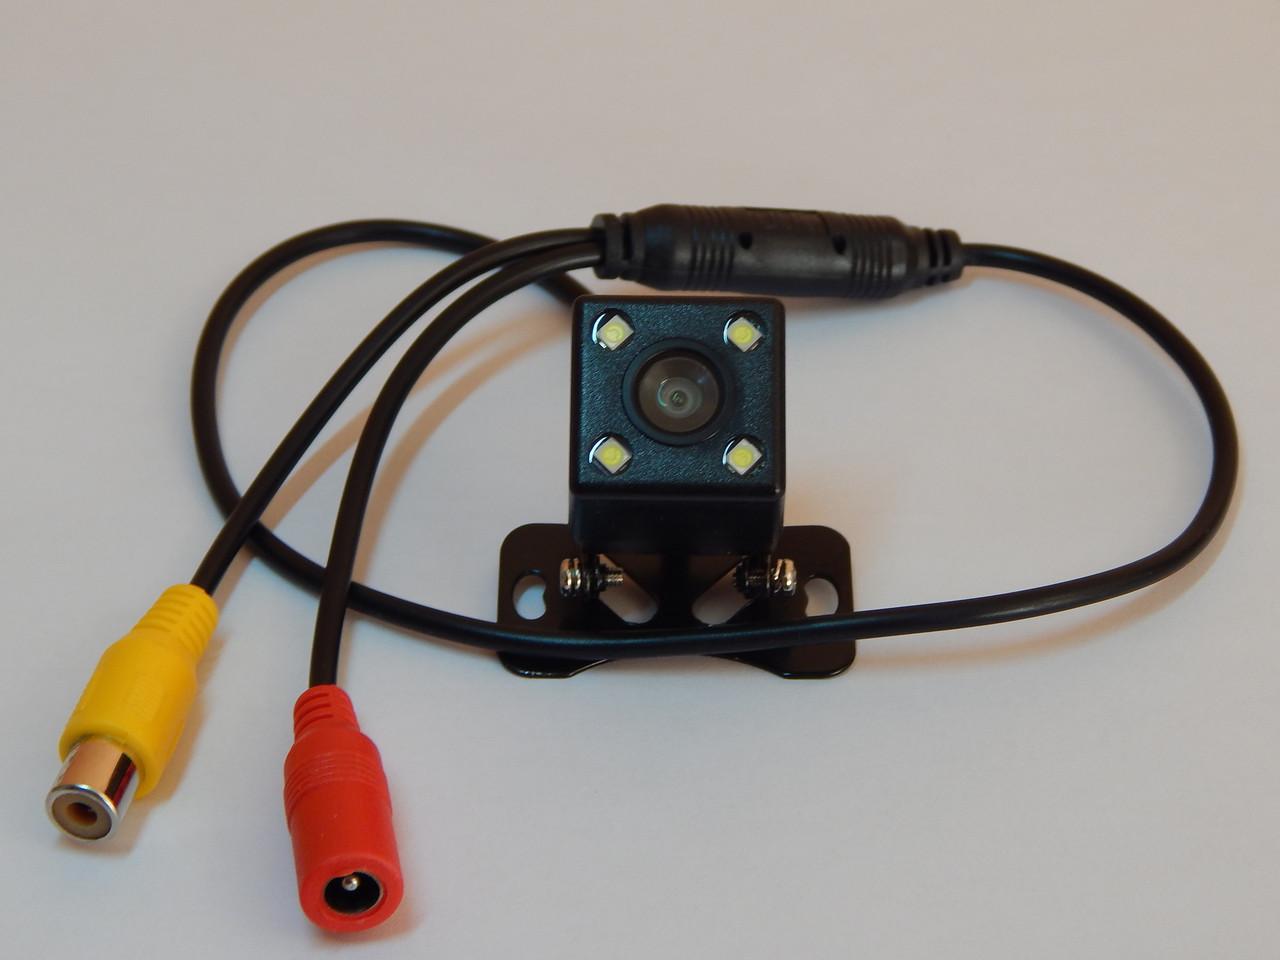 Камера огляду заднього ходу ZIRY 4-LED night vision